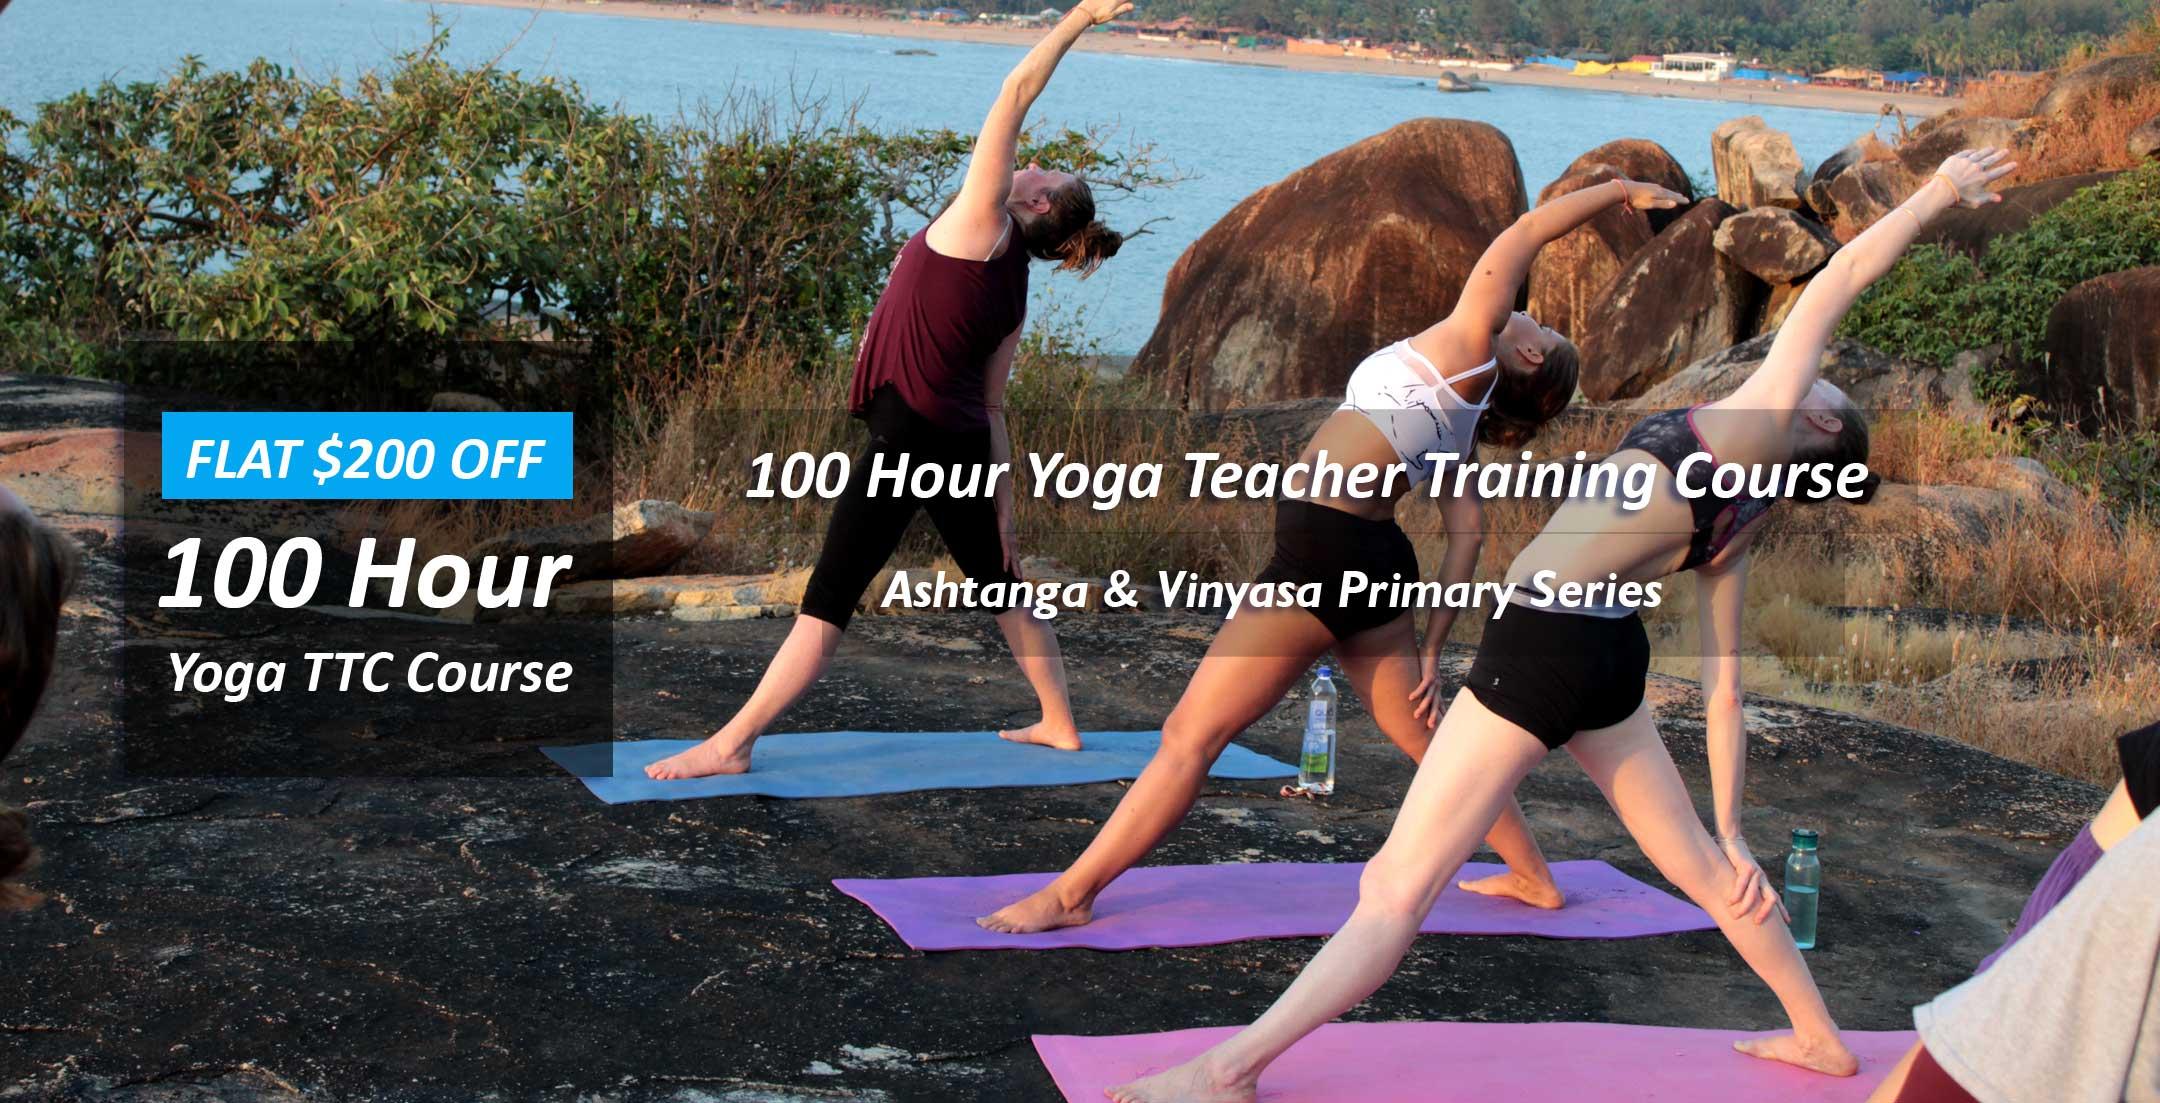 Bali Yoga Ashram 100 Hour Yoga Teacher Training In Bali 100 Hour Yoga Teacher Training In Indonesia 100 Hour Yoga Teacher Training Course In Bali 100 Hour Yoga